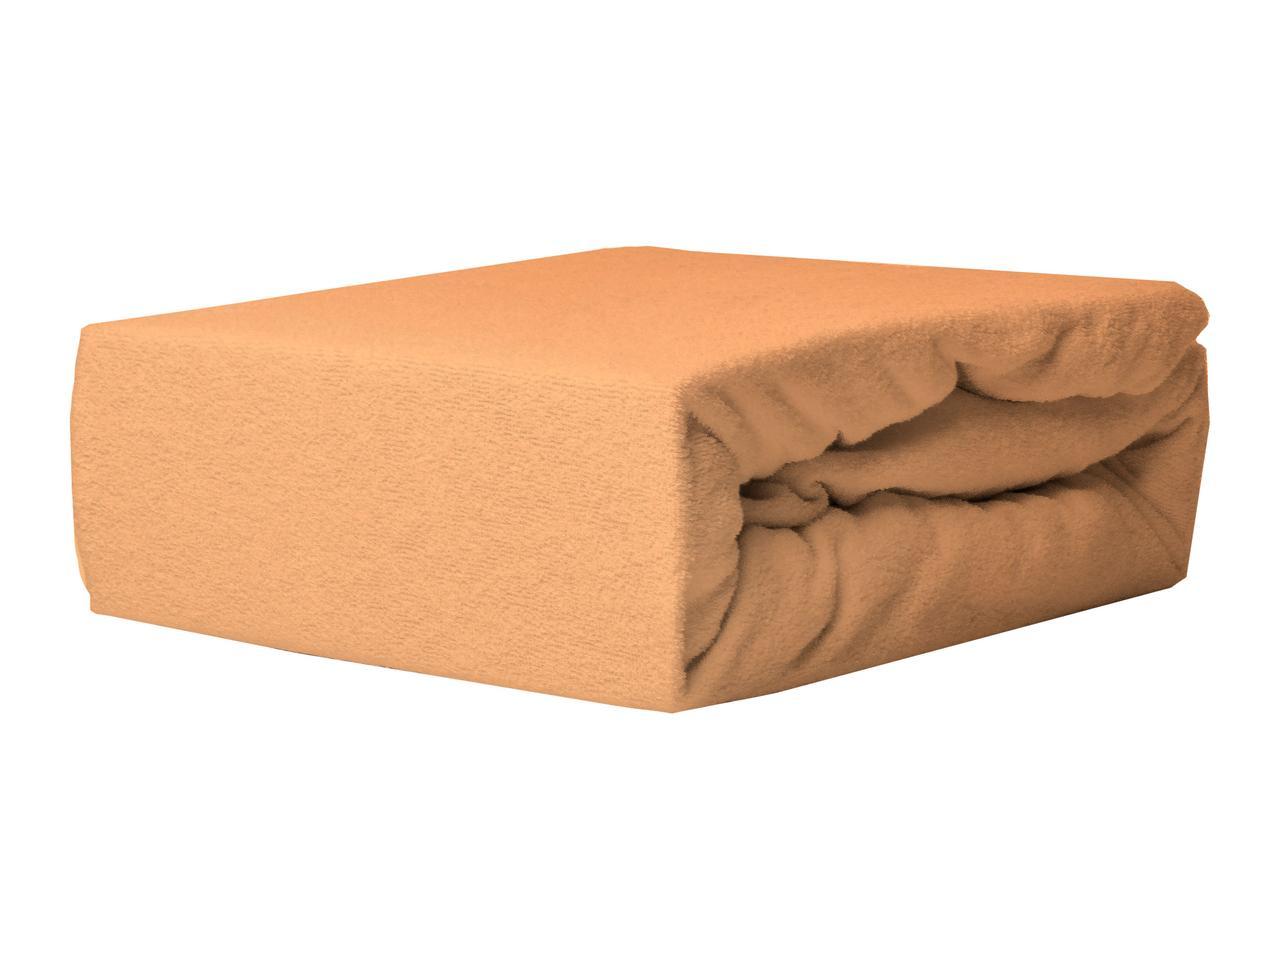 Простыня Махровая Без резинки NR 010D Darymex 3873 160x200 см Оранжевая